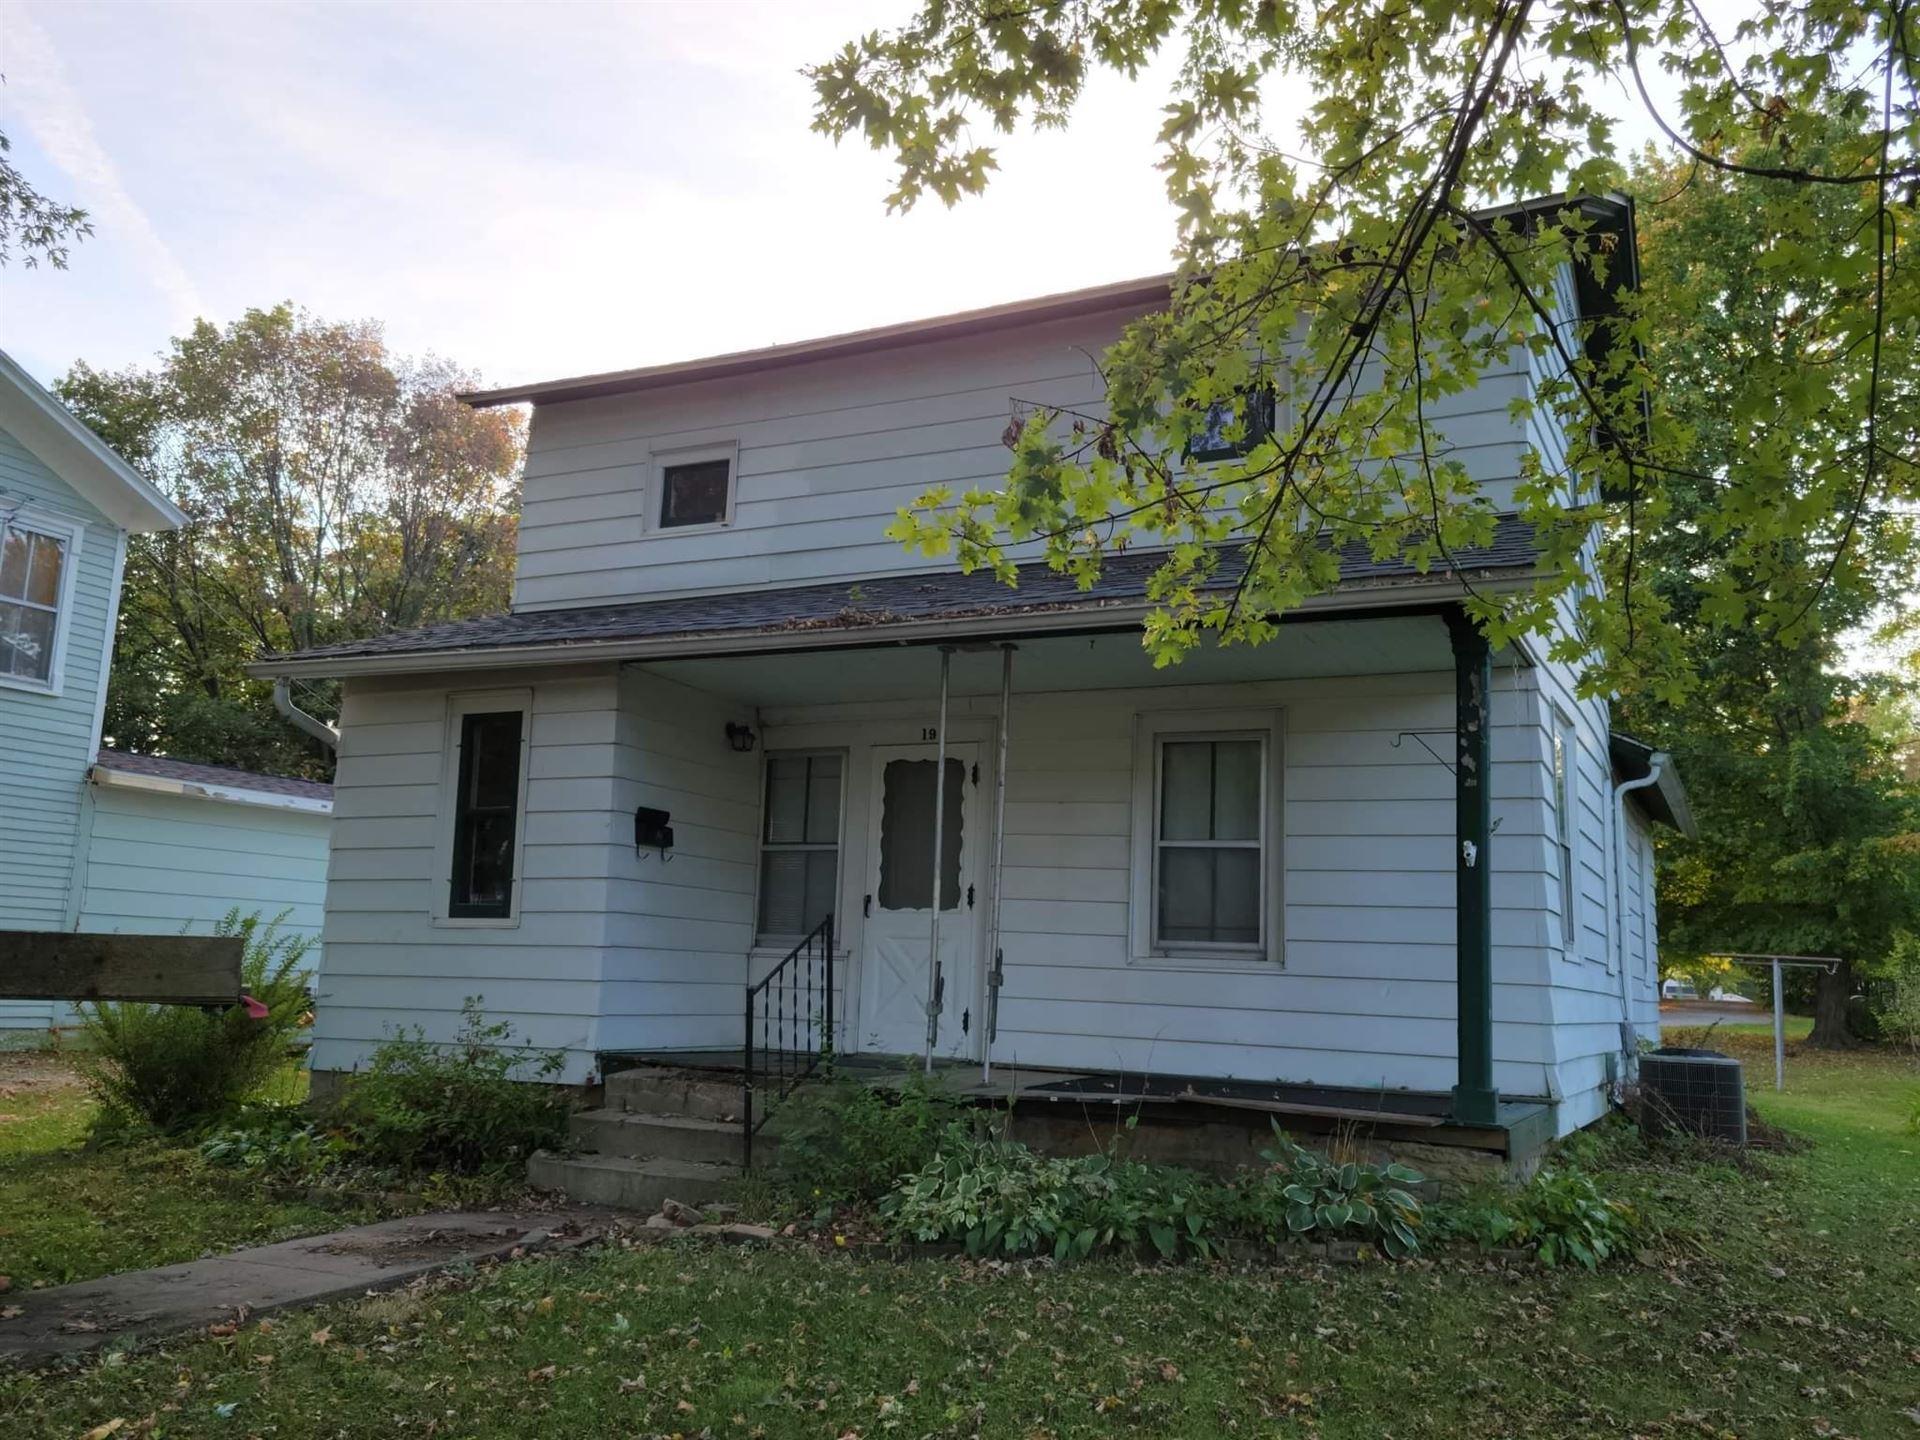 19 S 3rd St, Evansville, WI 53536 - #: 1921778